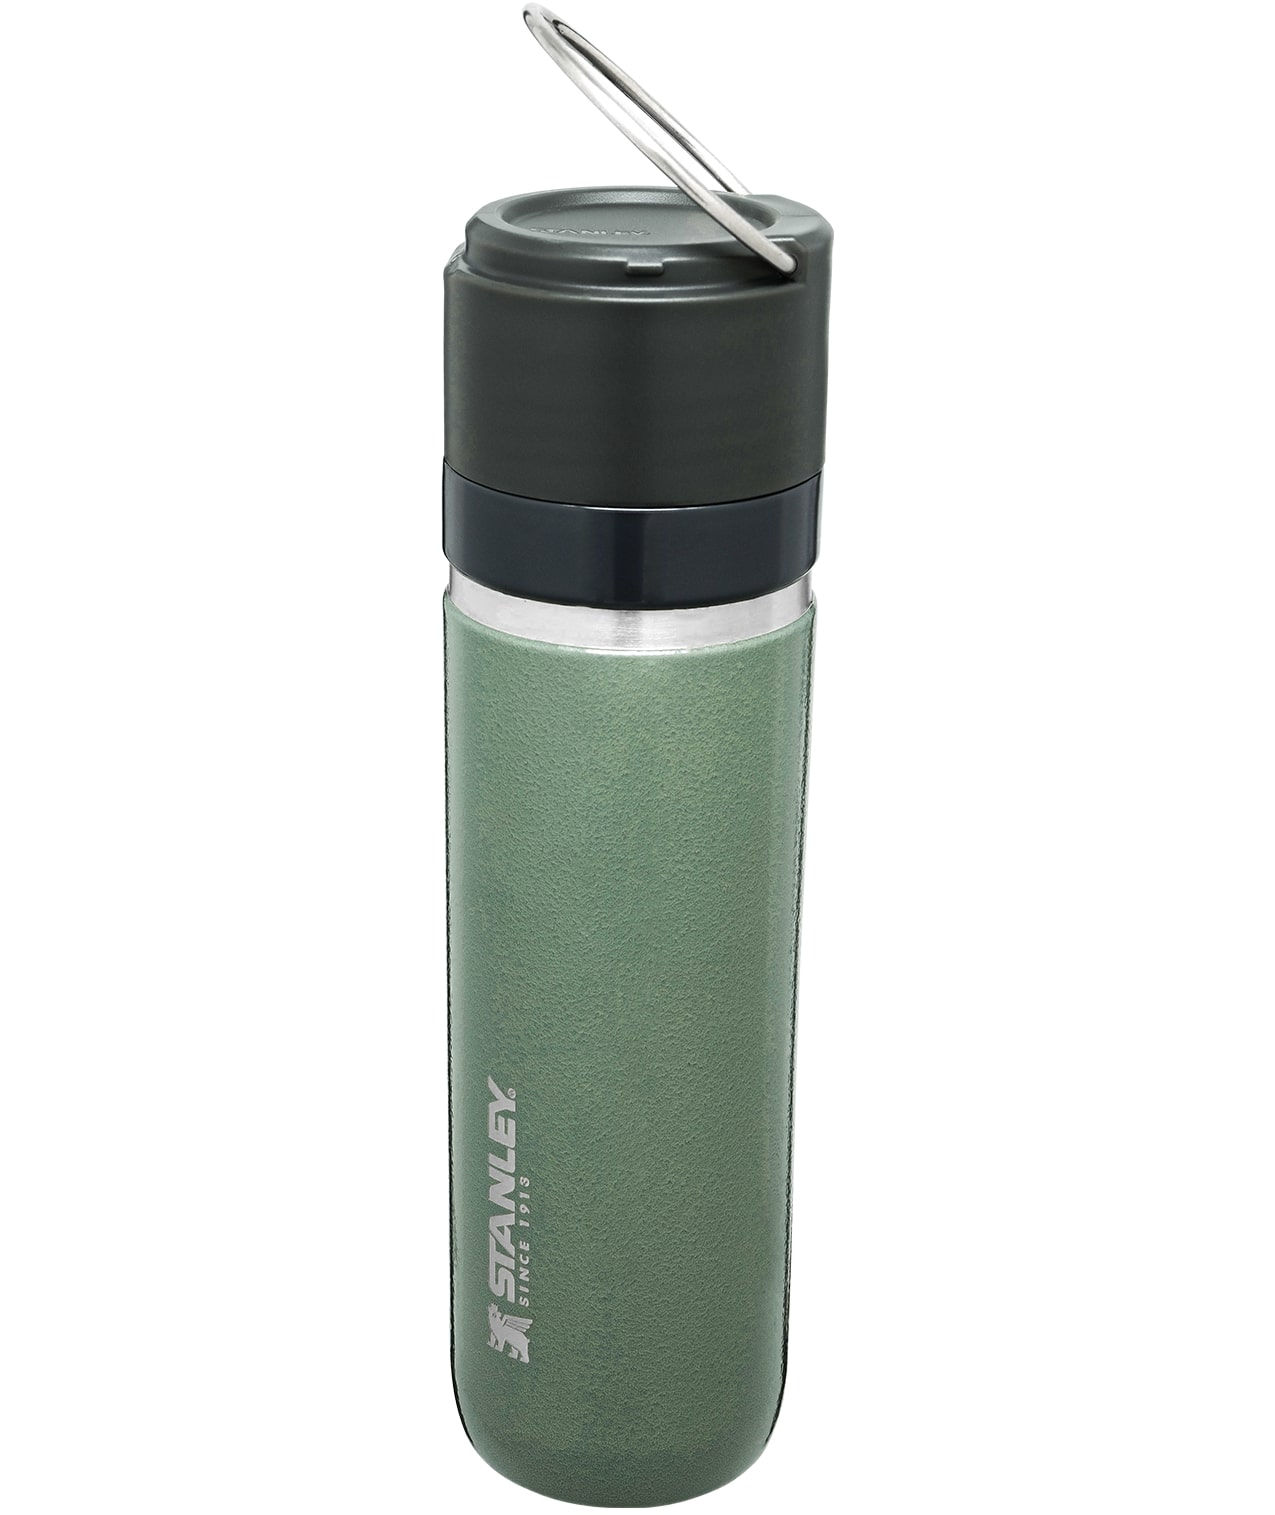 Bình giữ nhiệt Stanley Ceramivac GO Bottle 24oz